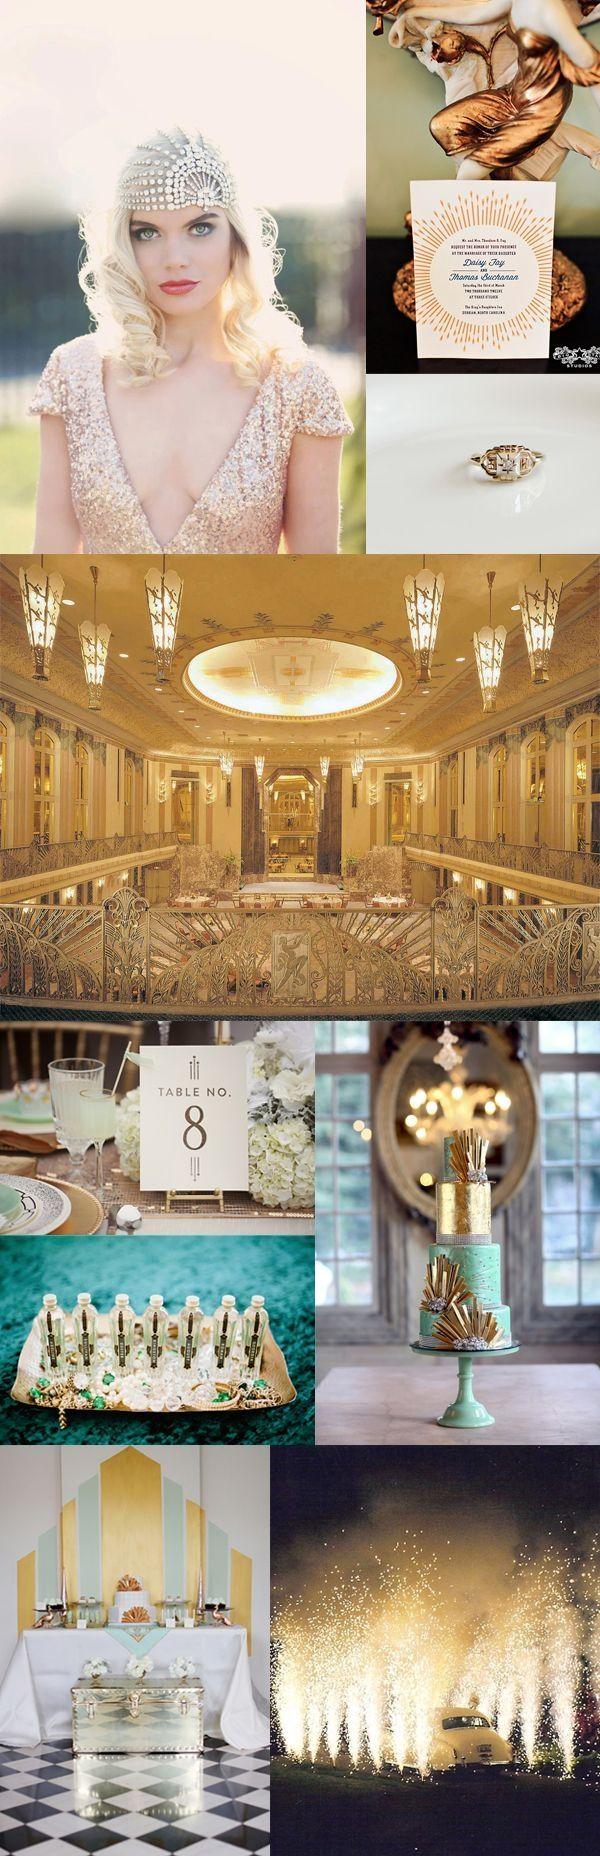 1920's | Gatsby Glam | Art Deco | Wedding | Vintage | Old Hollywood | Wedding Decor & Design